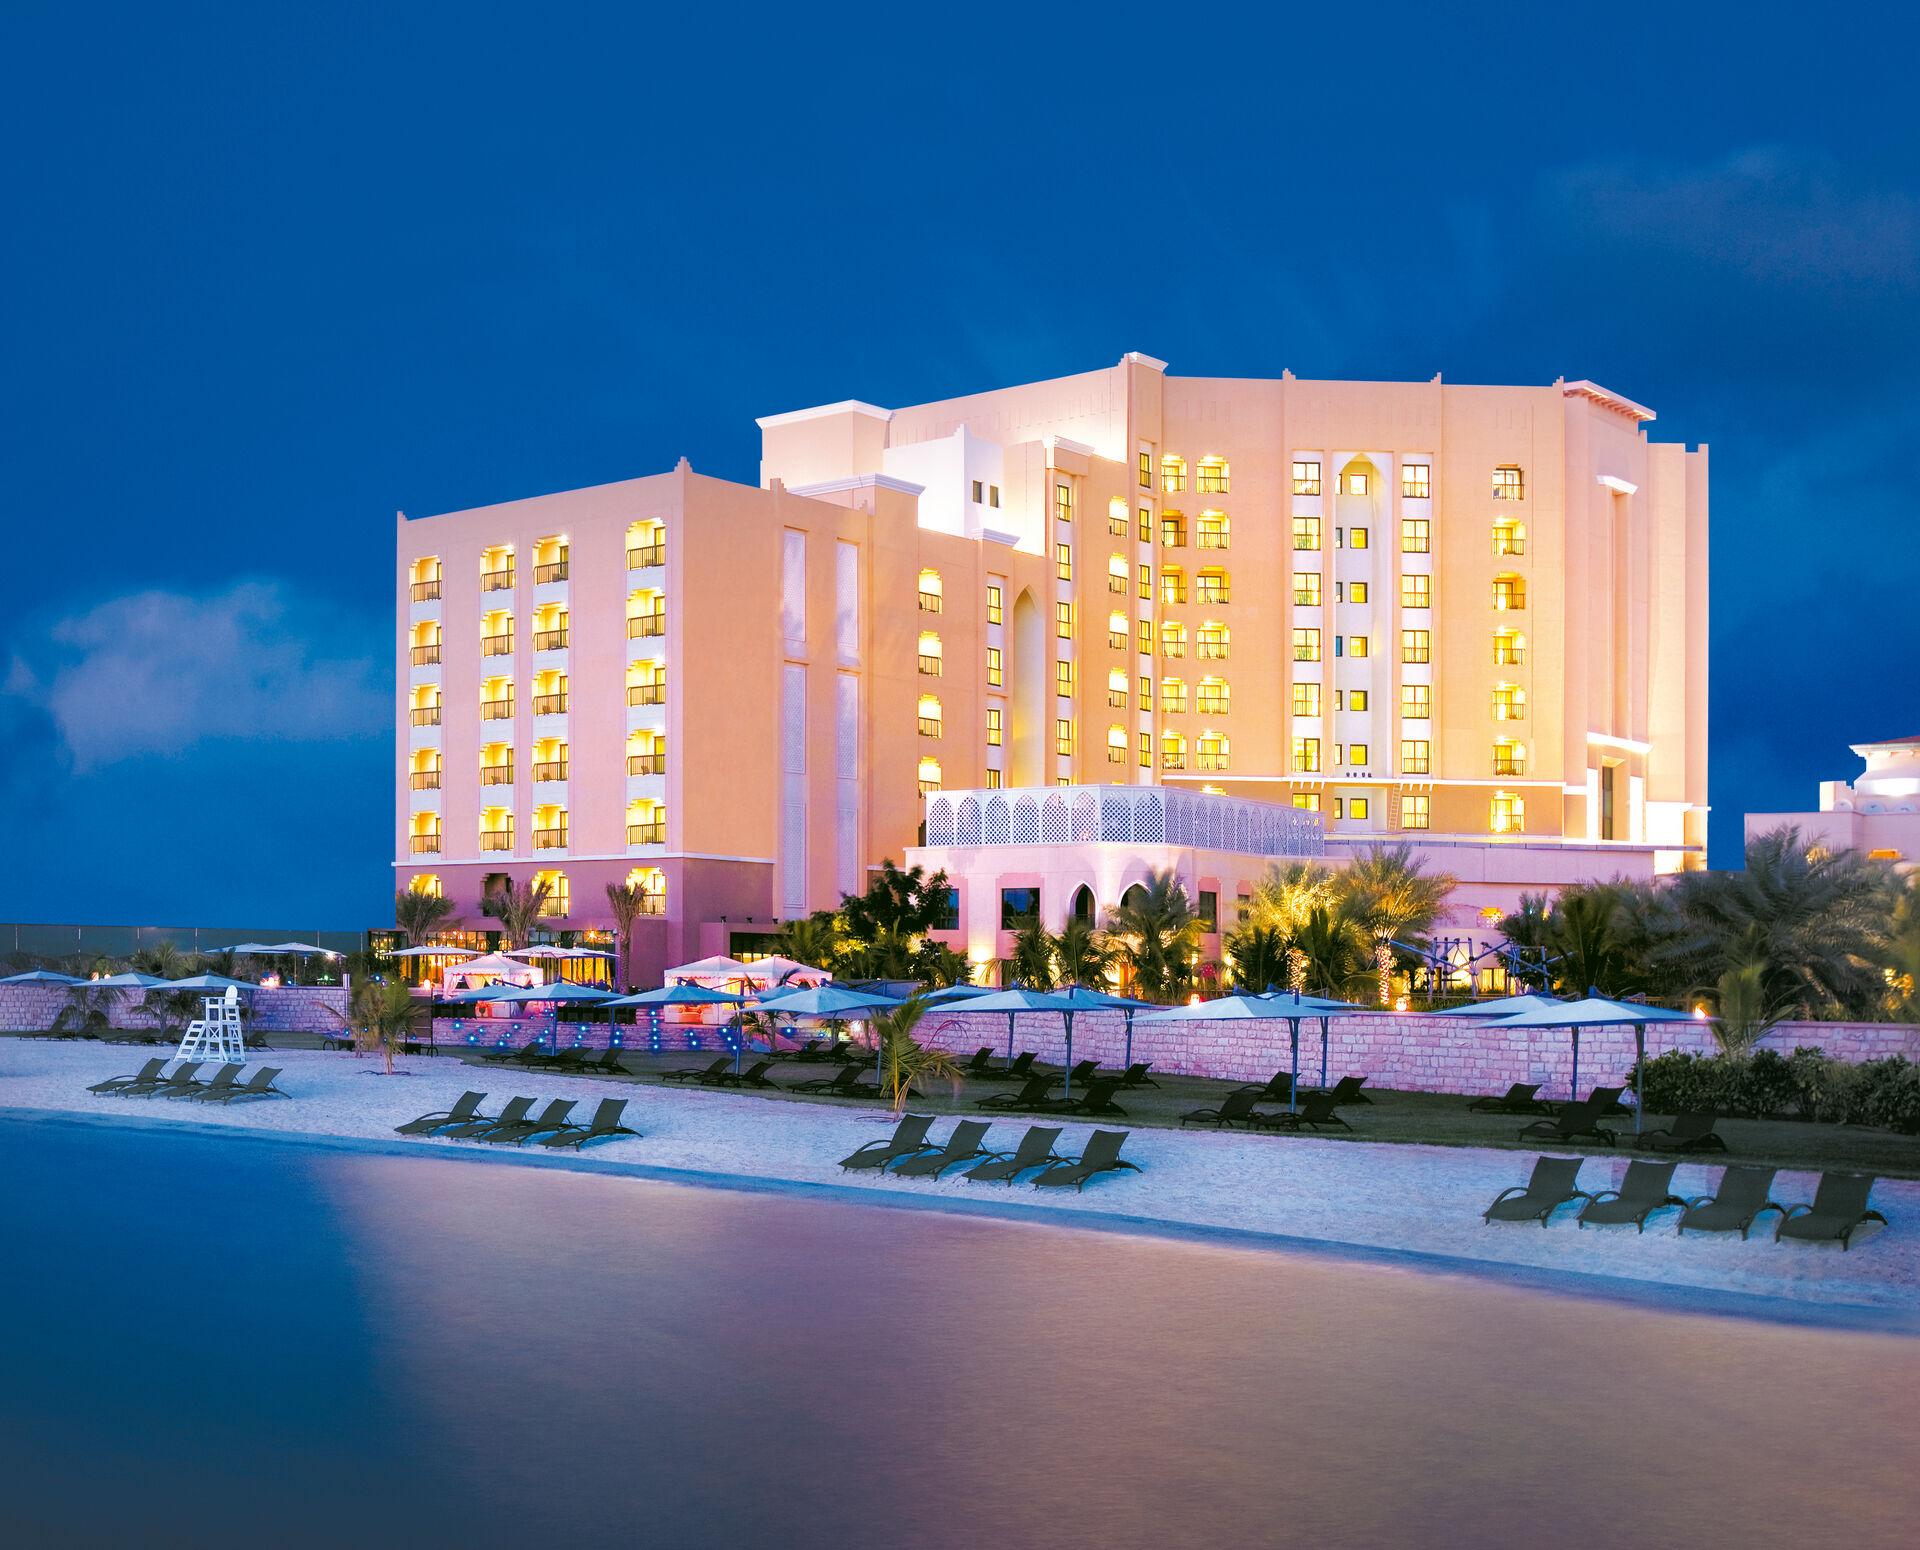 Séjour Abu Dhabi - Traders Hotel Qaryat Al Beri - 4*